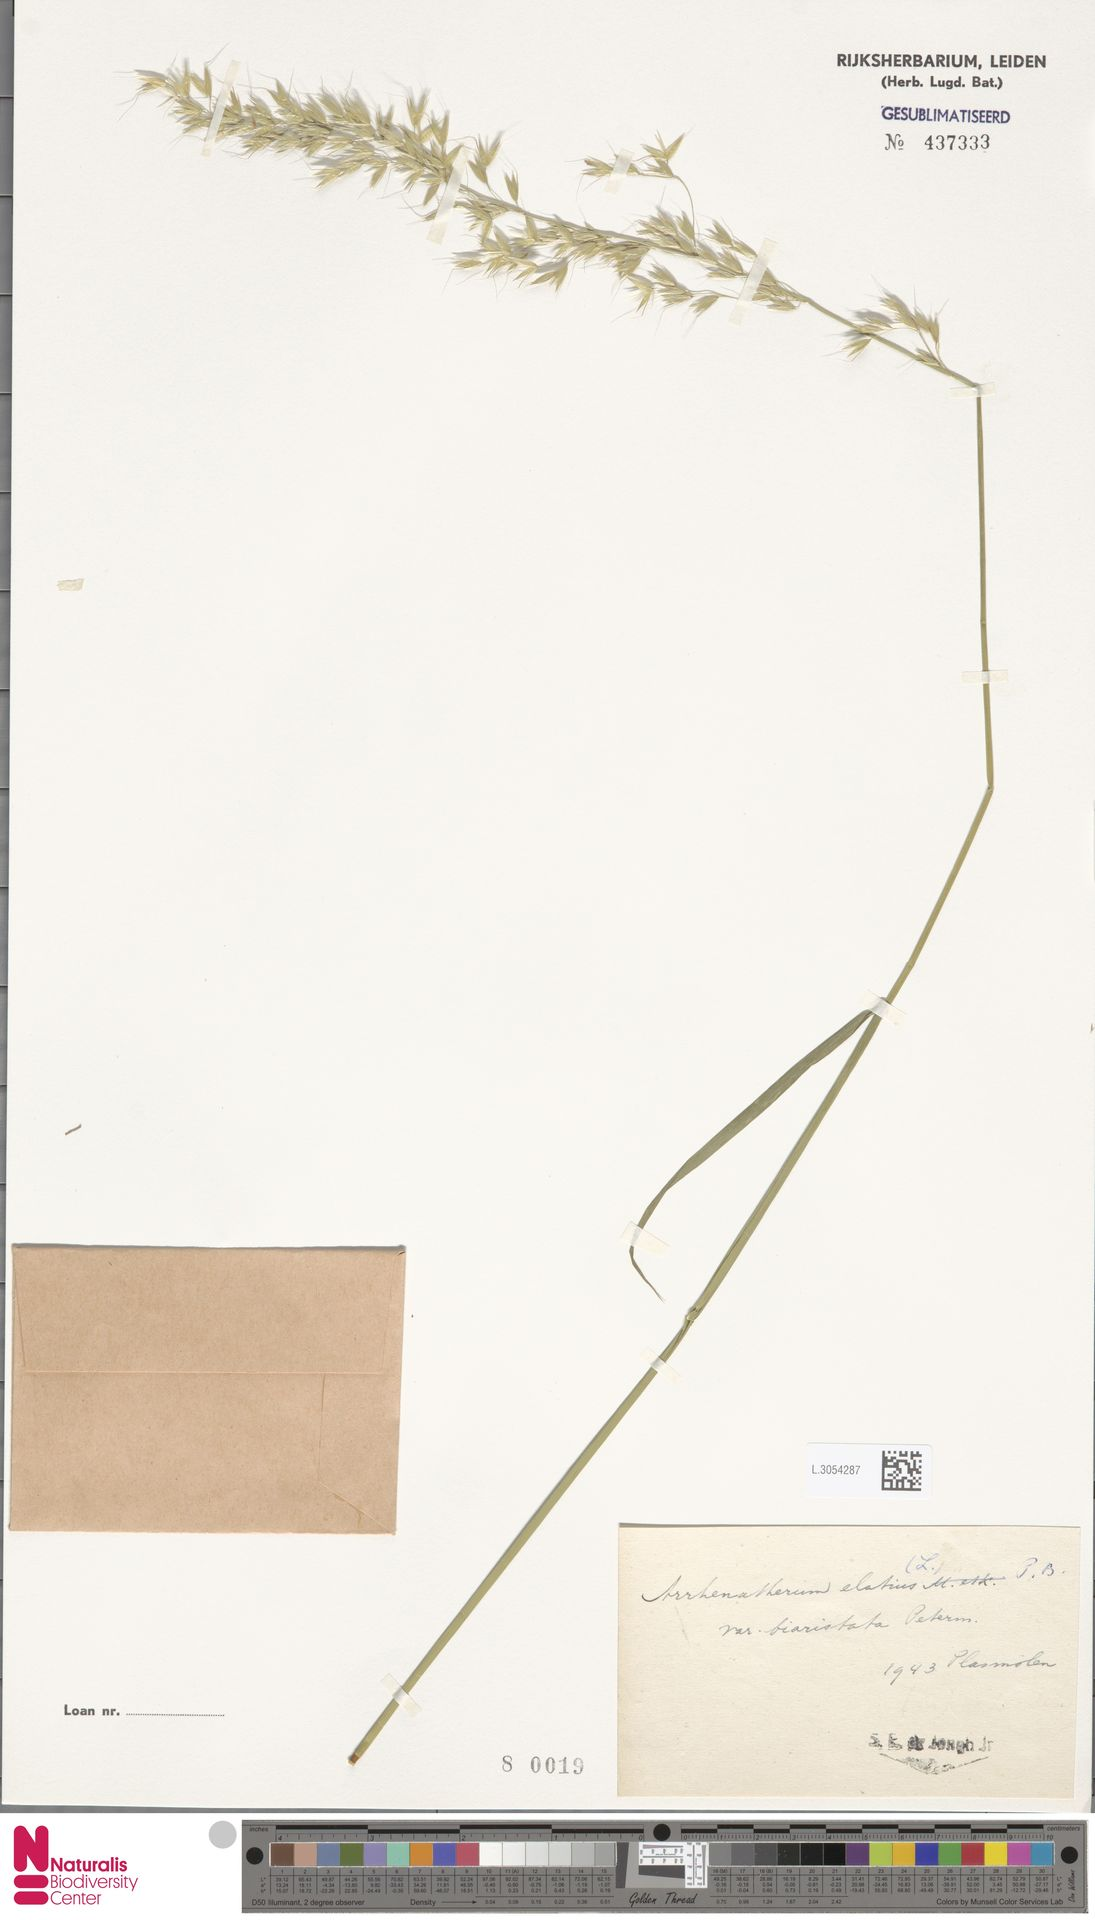 L.3054287 | Arrhenatherum elatius (L.) P.Beauv. ex J.Presl & C.Presl